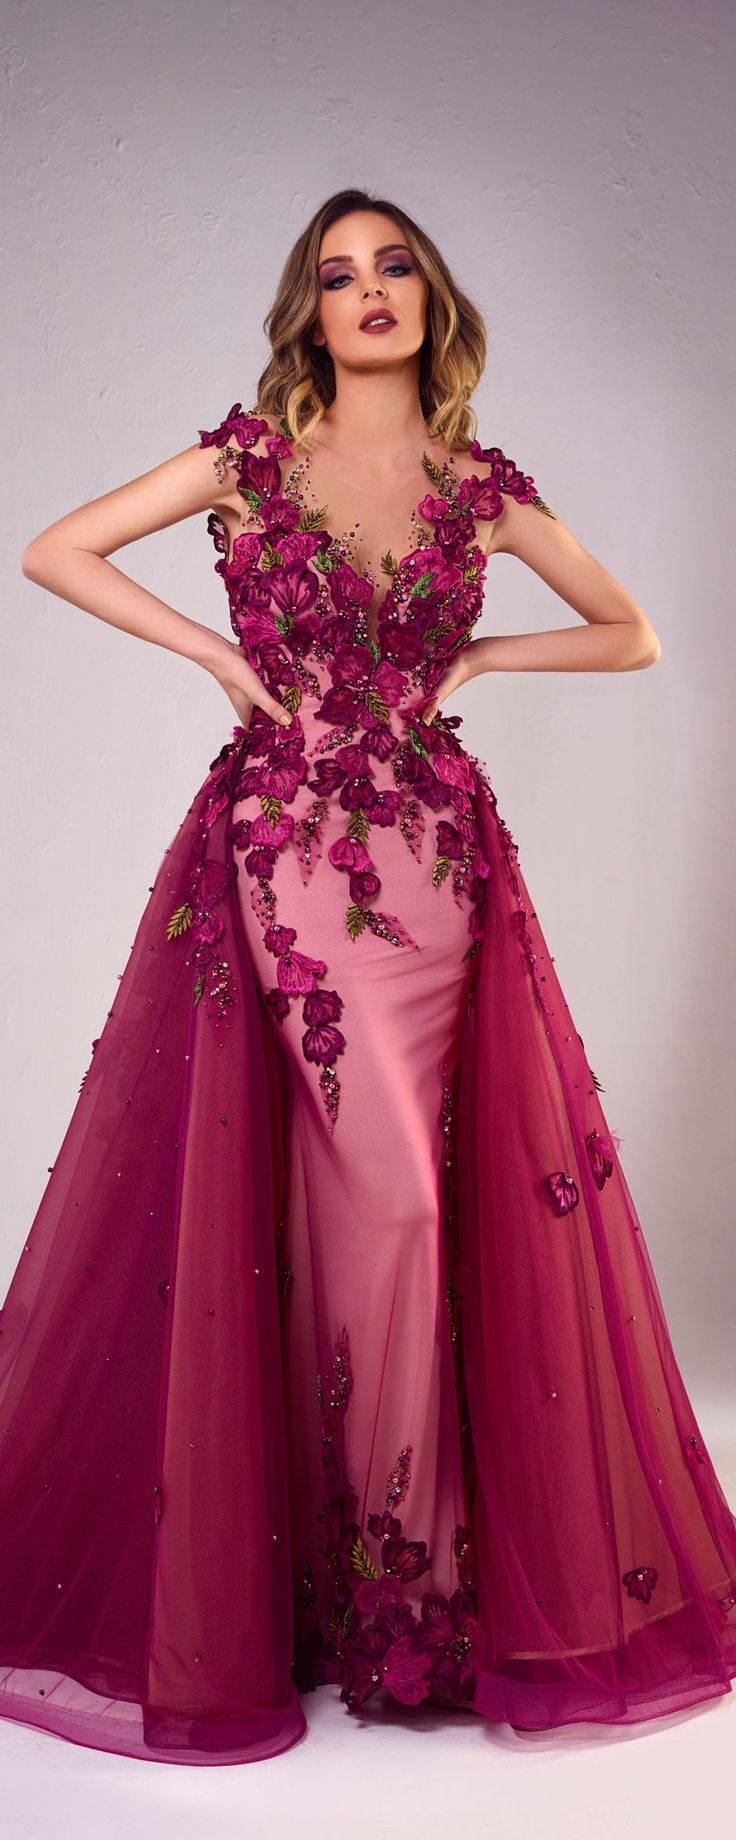 Tony Chaaya Collection 2018 – Haute couture – Benaceur